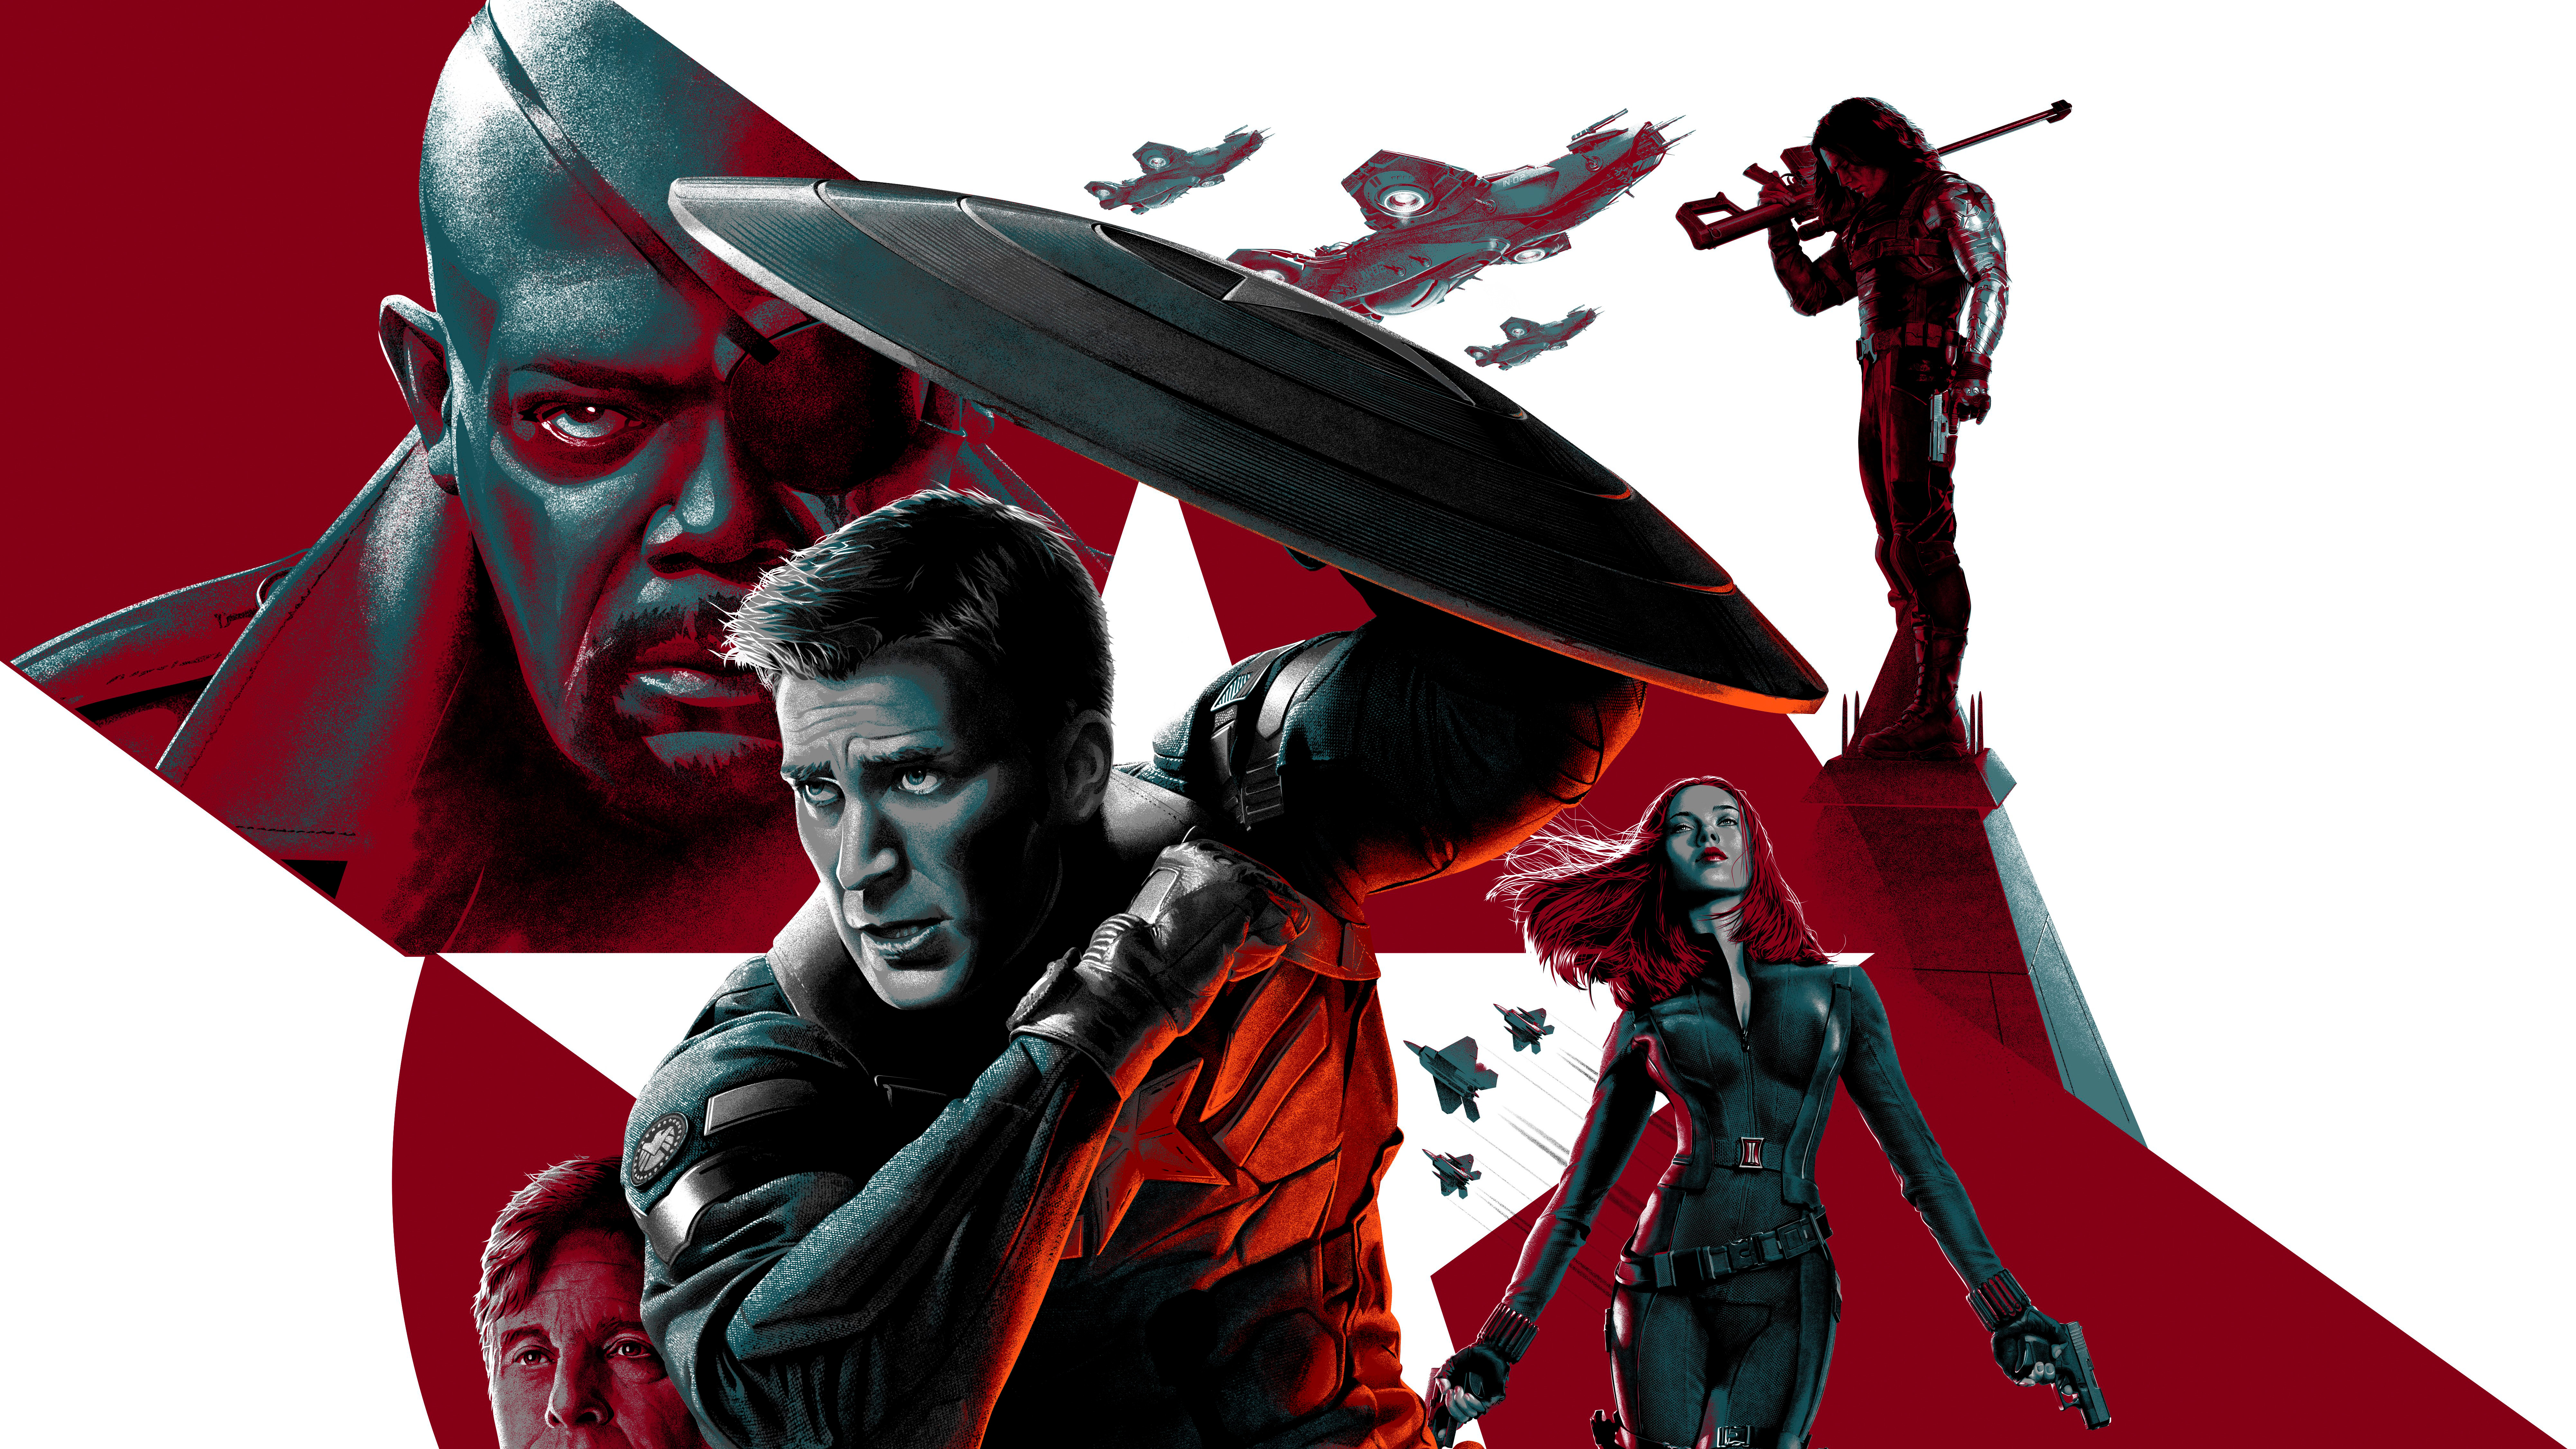 Captain America The Winter Soldier Wallpaper: 7680x4320 Captain America The Winter Soldier 8k 8k HD 4k